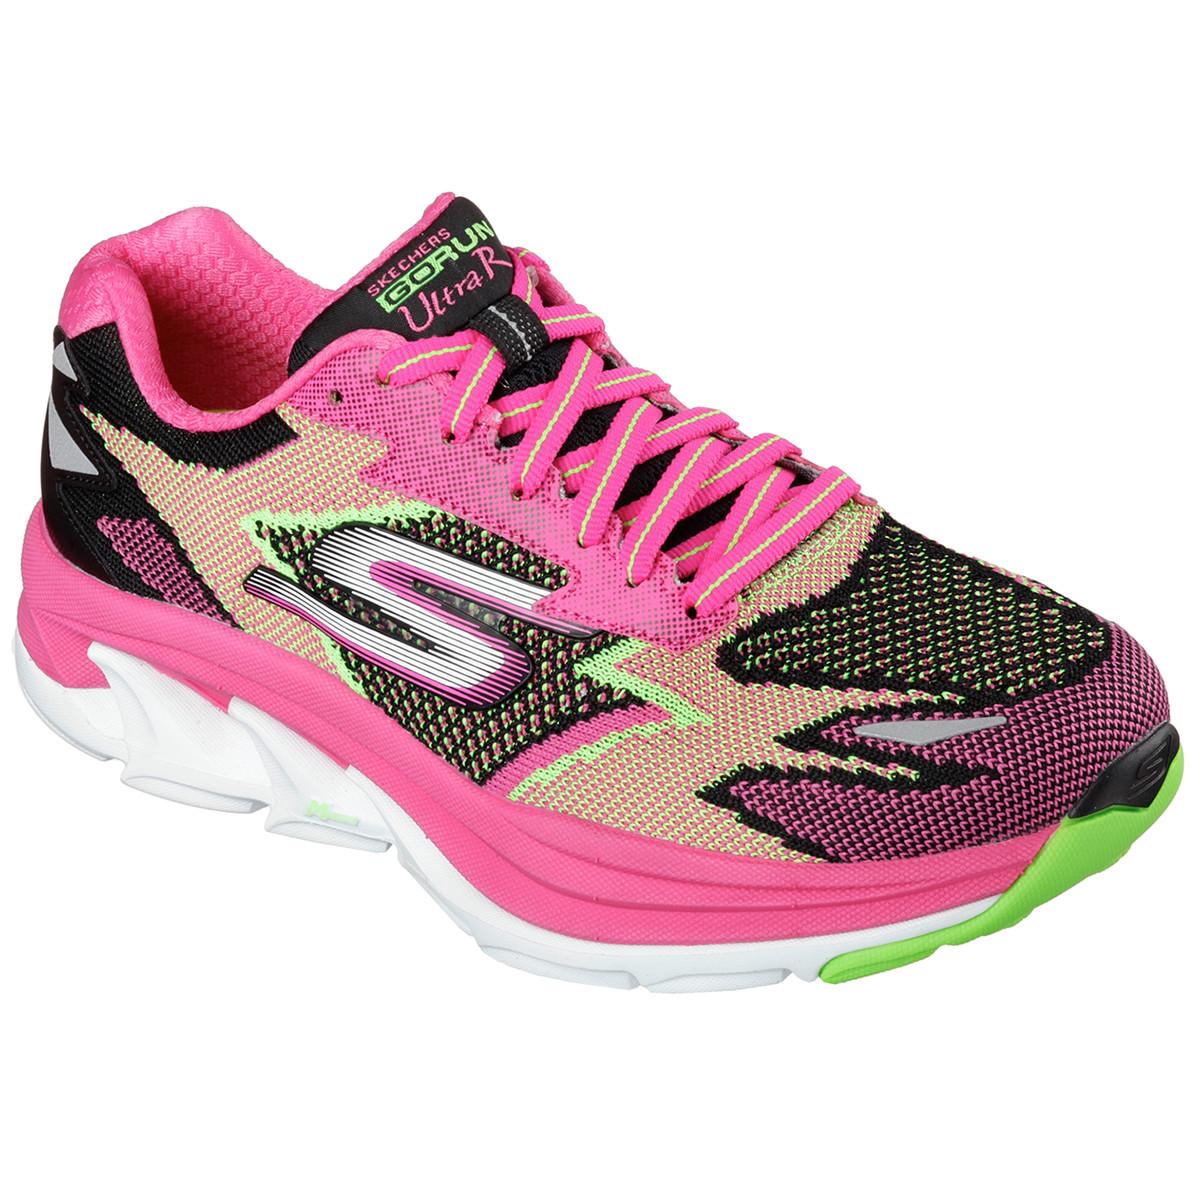 2b1df5c1a04 01-skechers-gorun-ultra-road-14005-bkhp-black-hot-pink.jpg